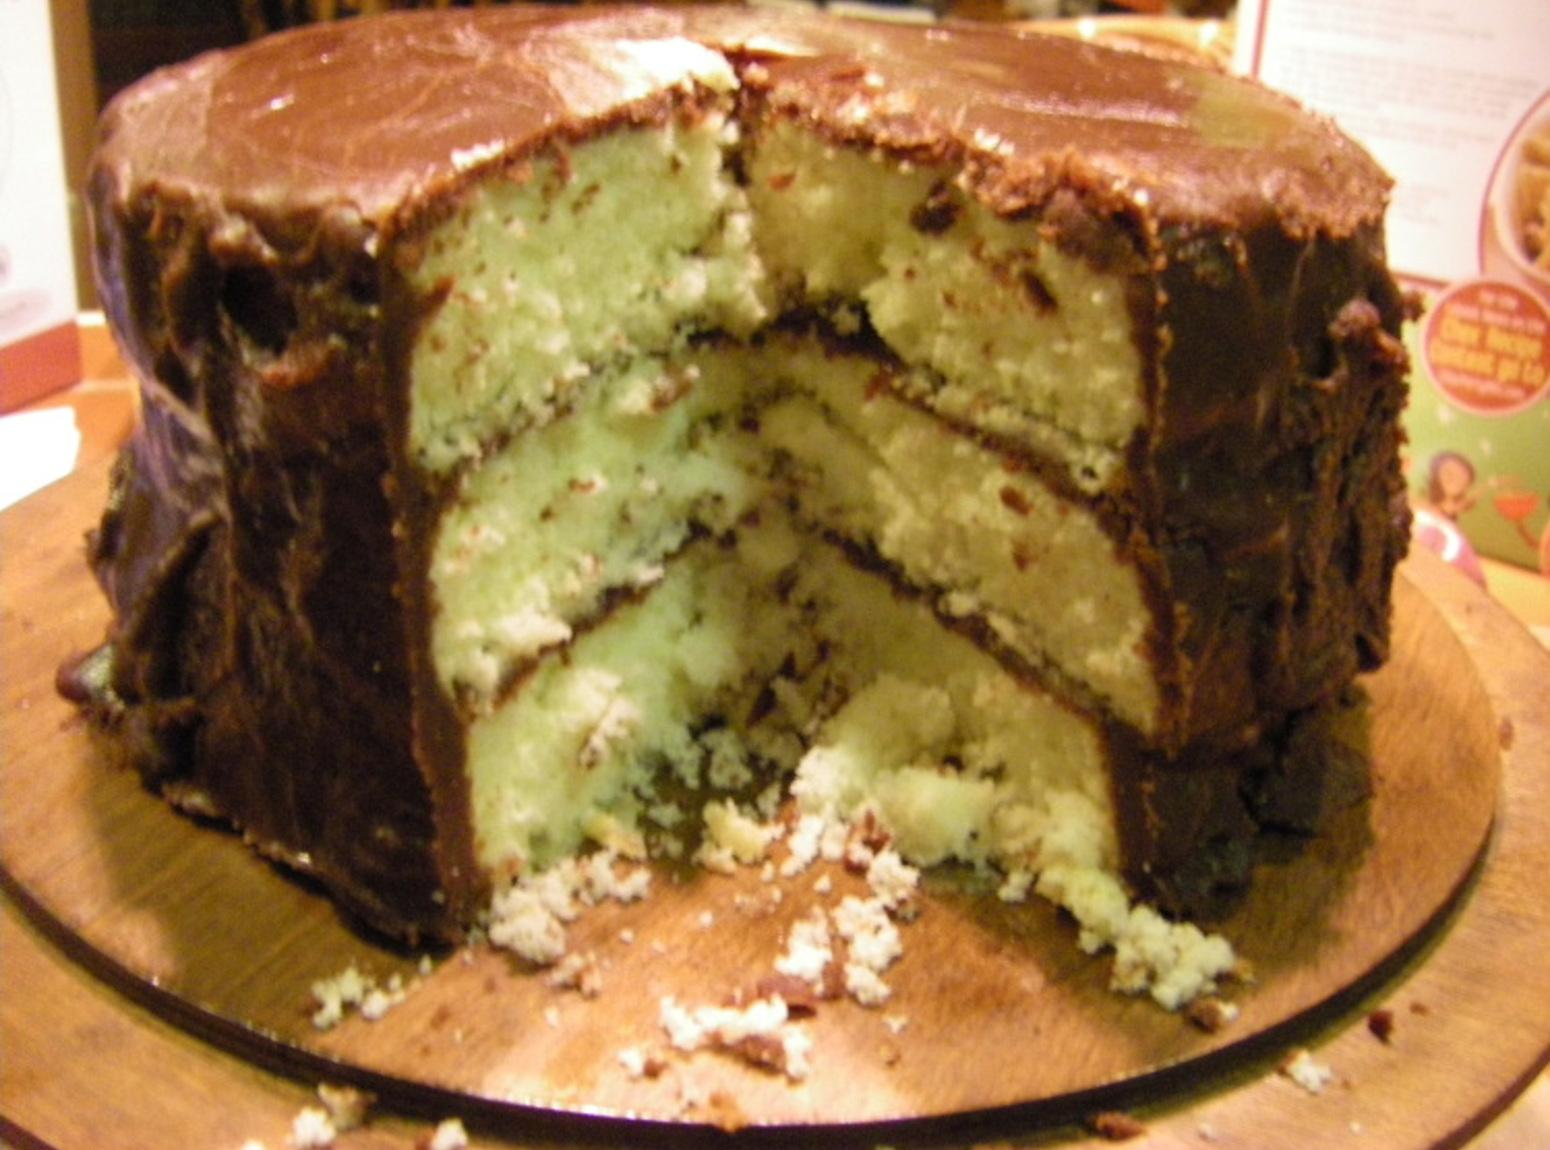 Mama S Cake Recipe Italian: Bonnie Butter Cake With Mama's Fudge Icing--Part I-Cake